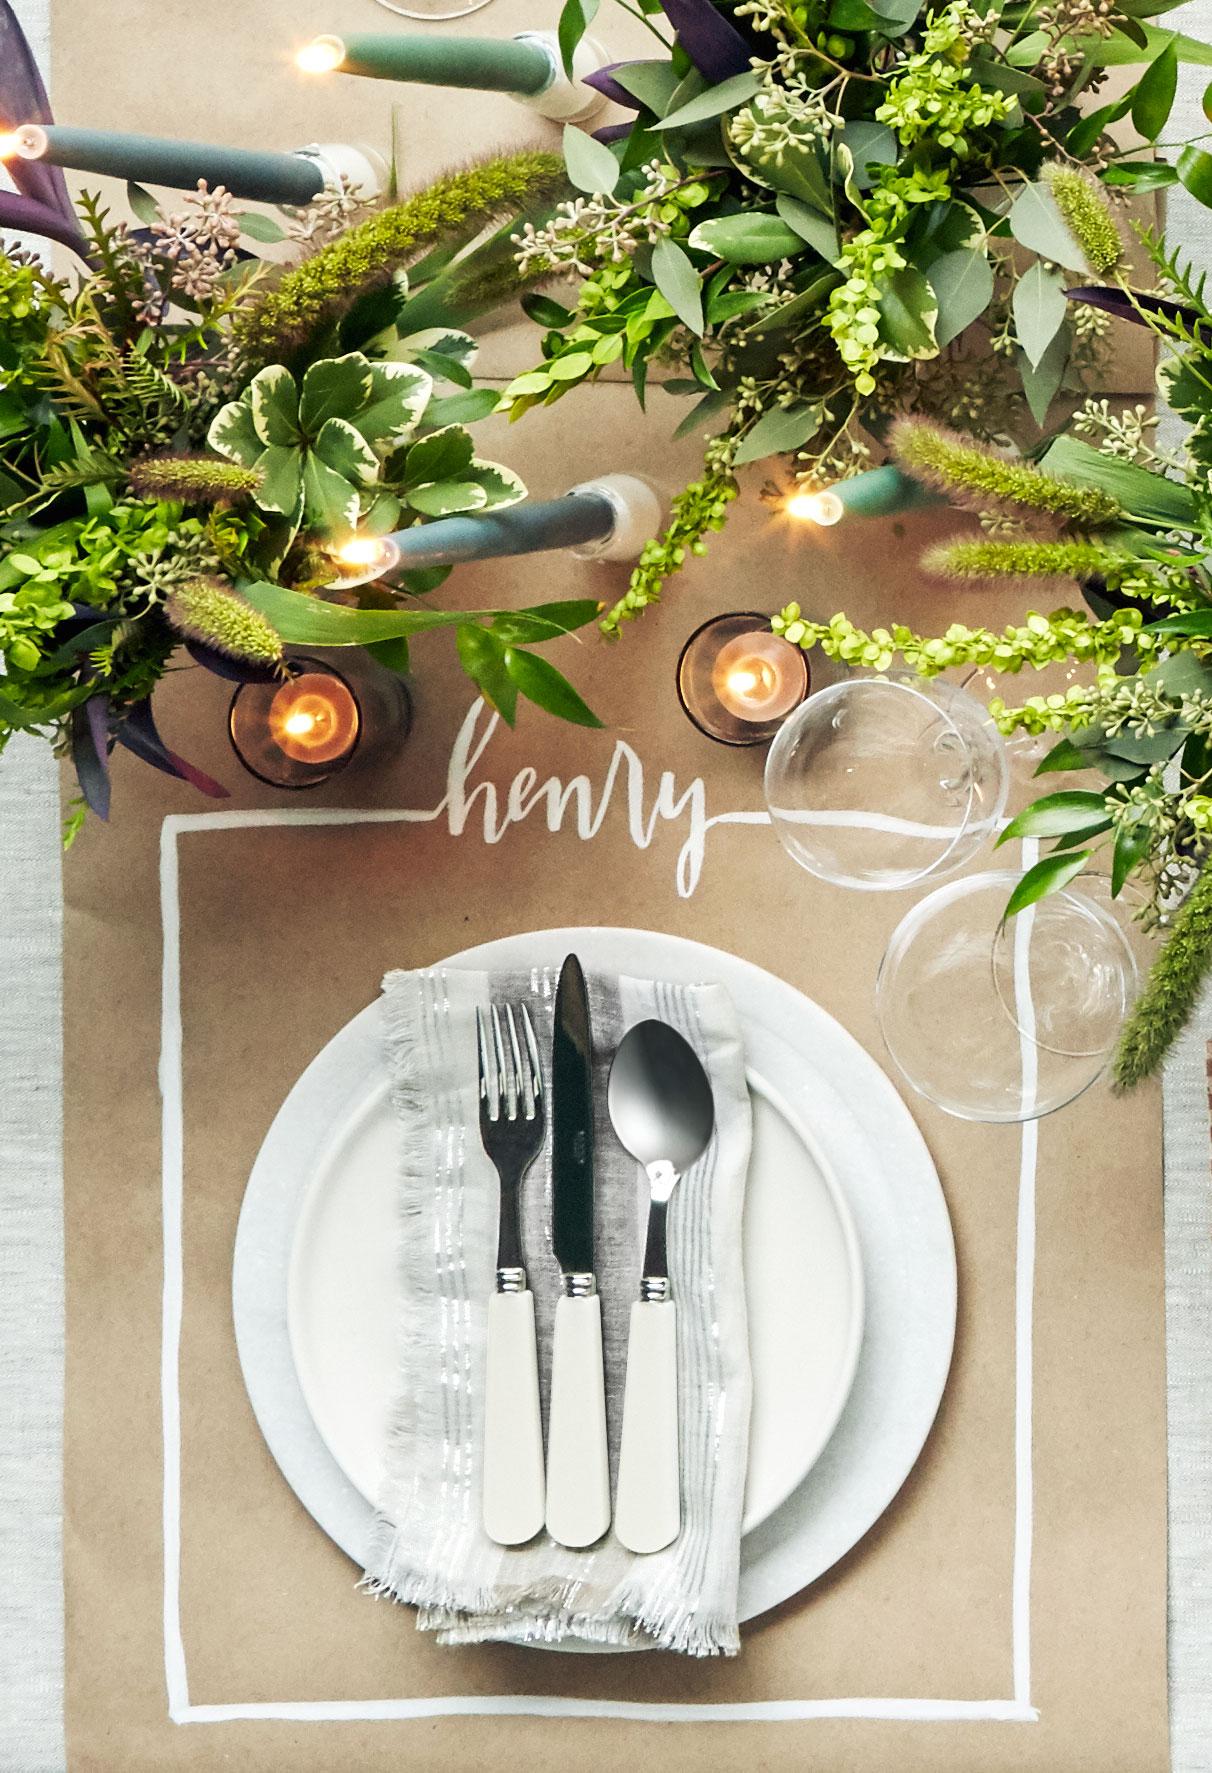 Fresh Rustic Wedding Table Settings - Wedding. Fresh Rustic Wedding Table Settings Wedding & Appealing Rustic Wedding Place Settings Pictures - Best Image Engine ...